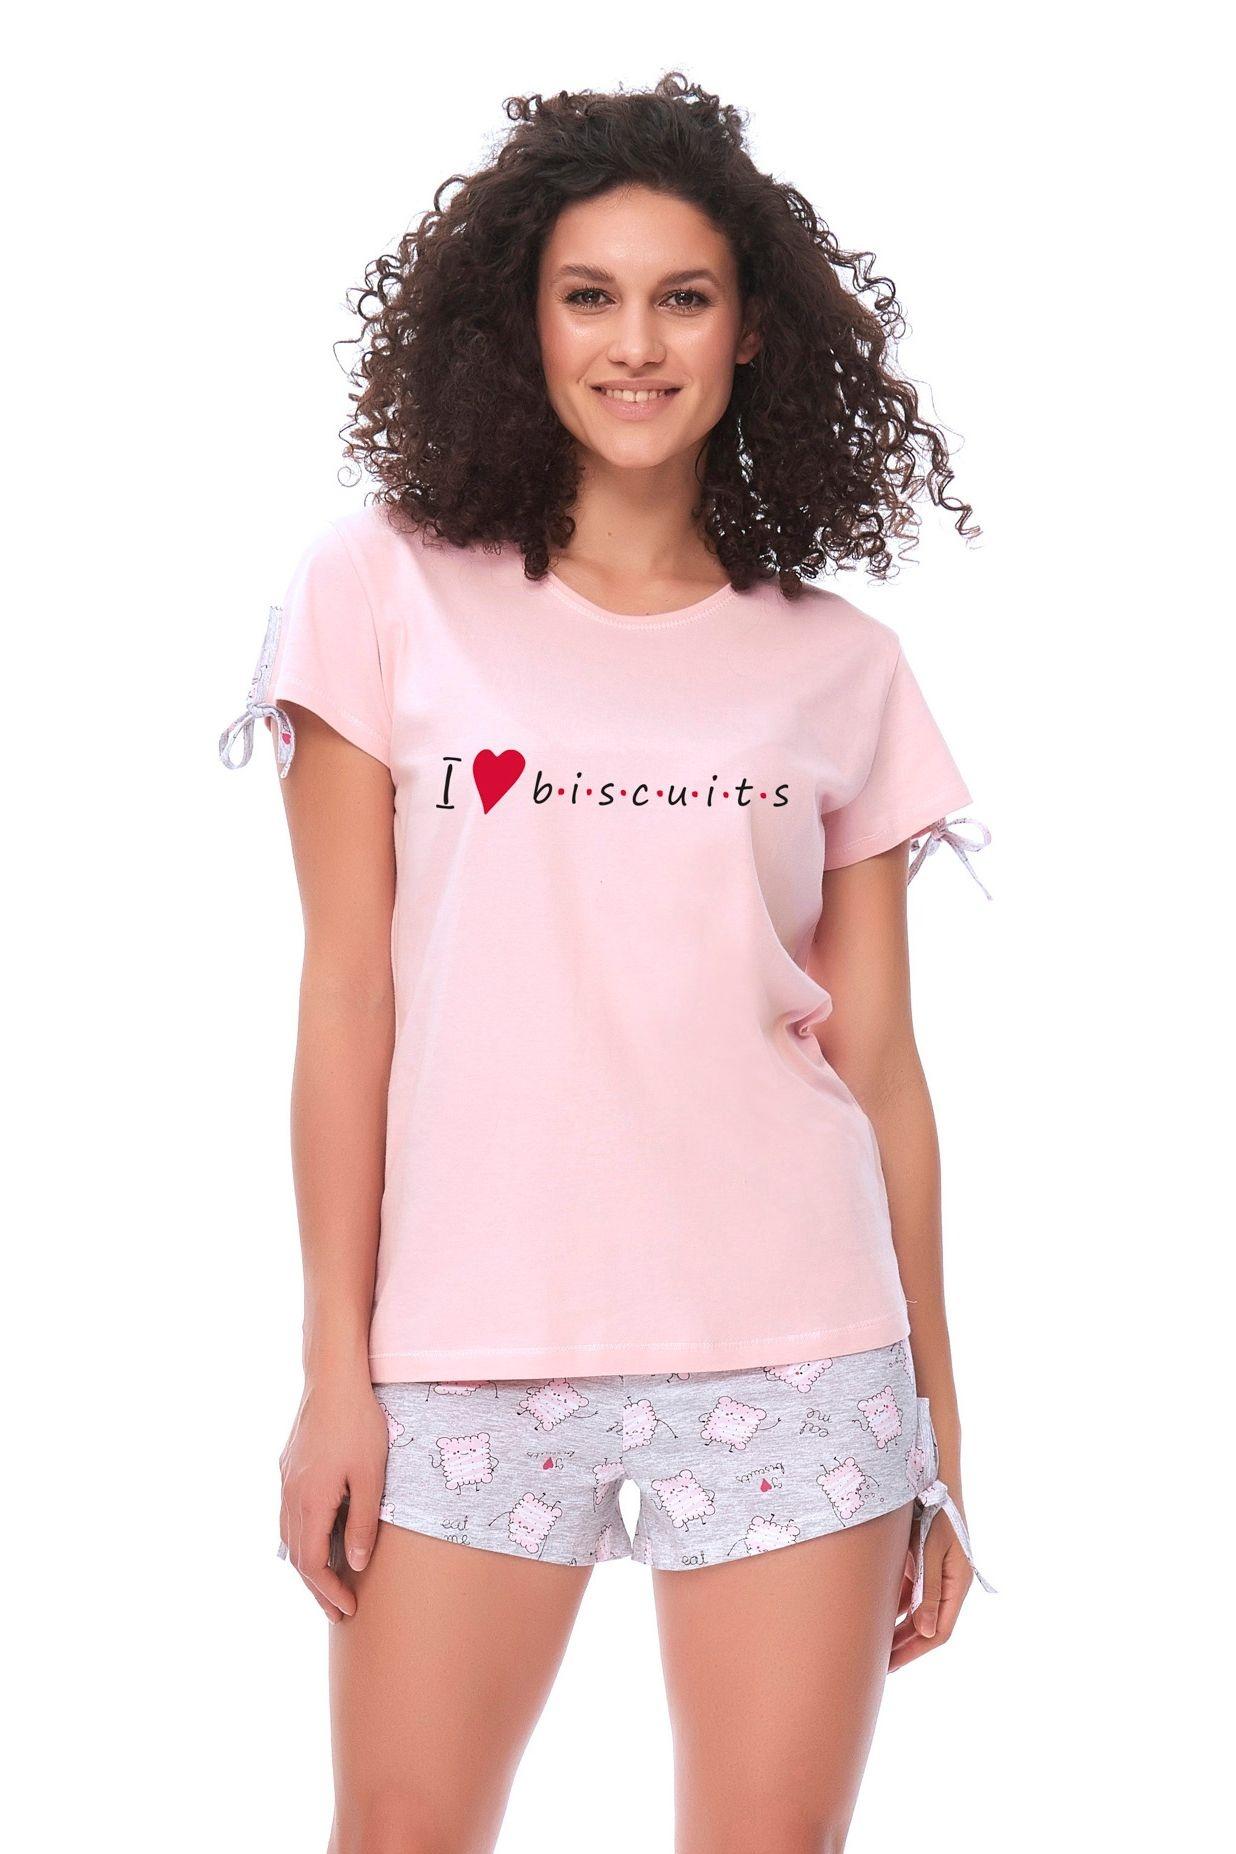 ff3dcd7595e Dámské pyžamo Biscuits růžové - ELEGANT.cz